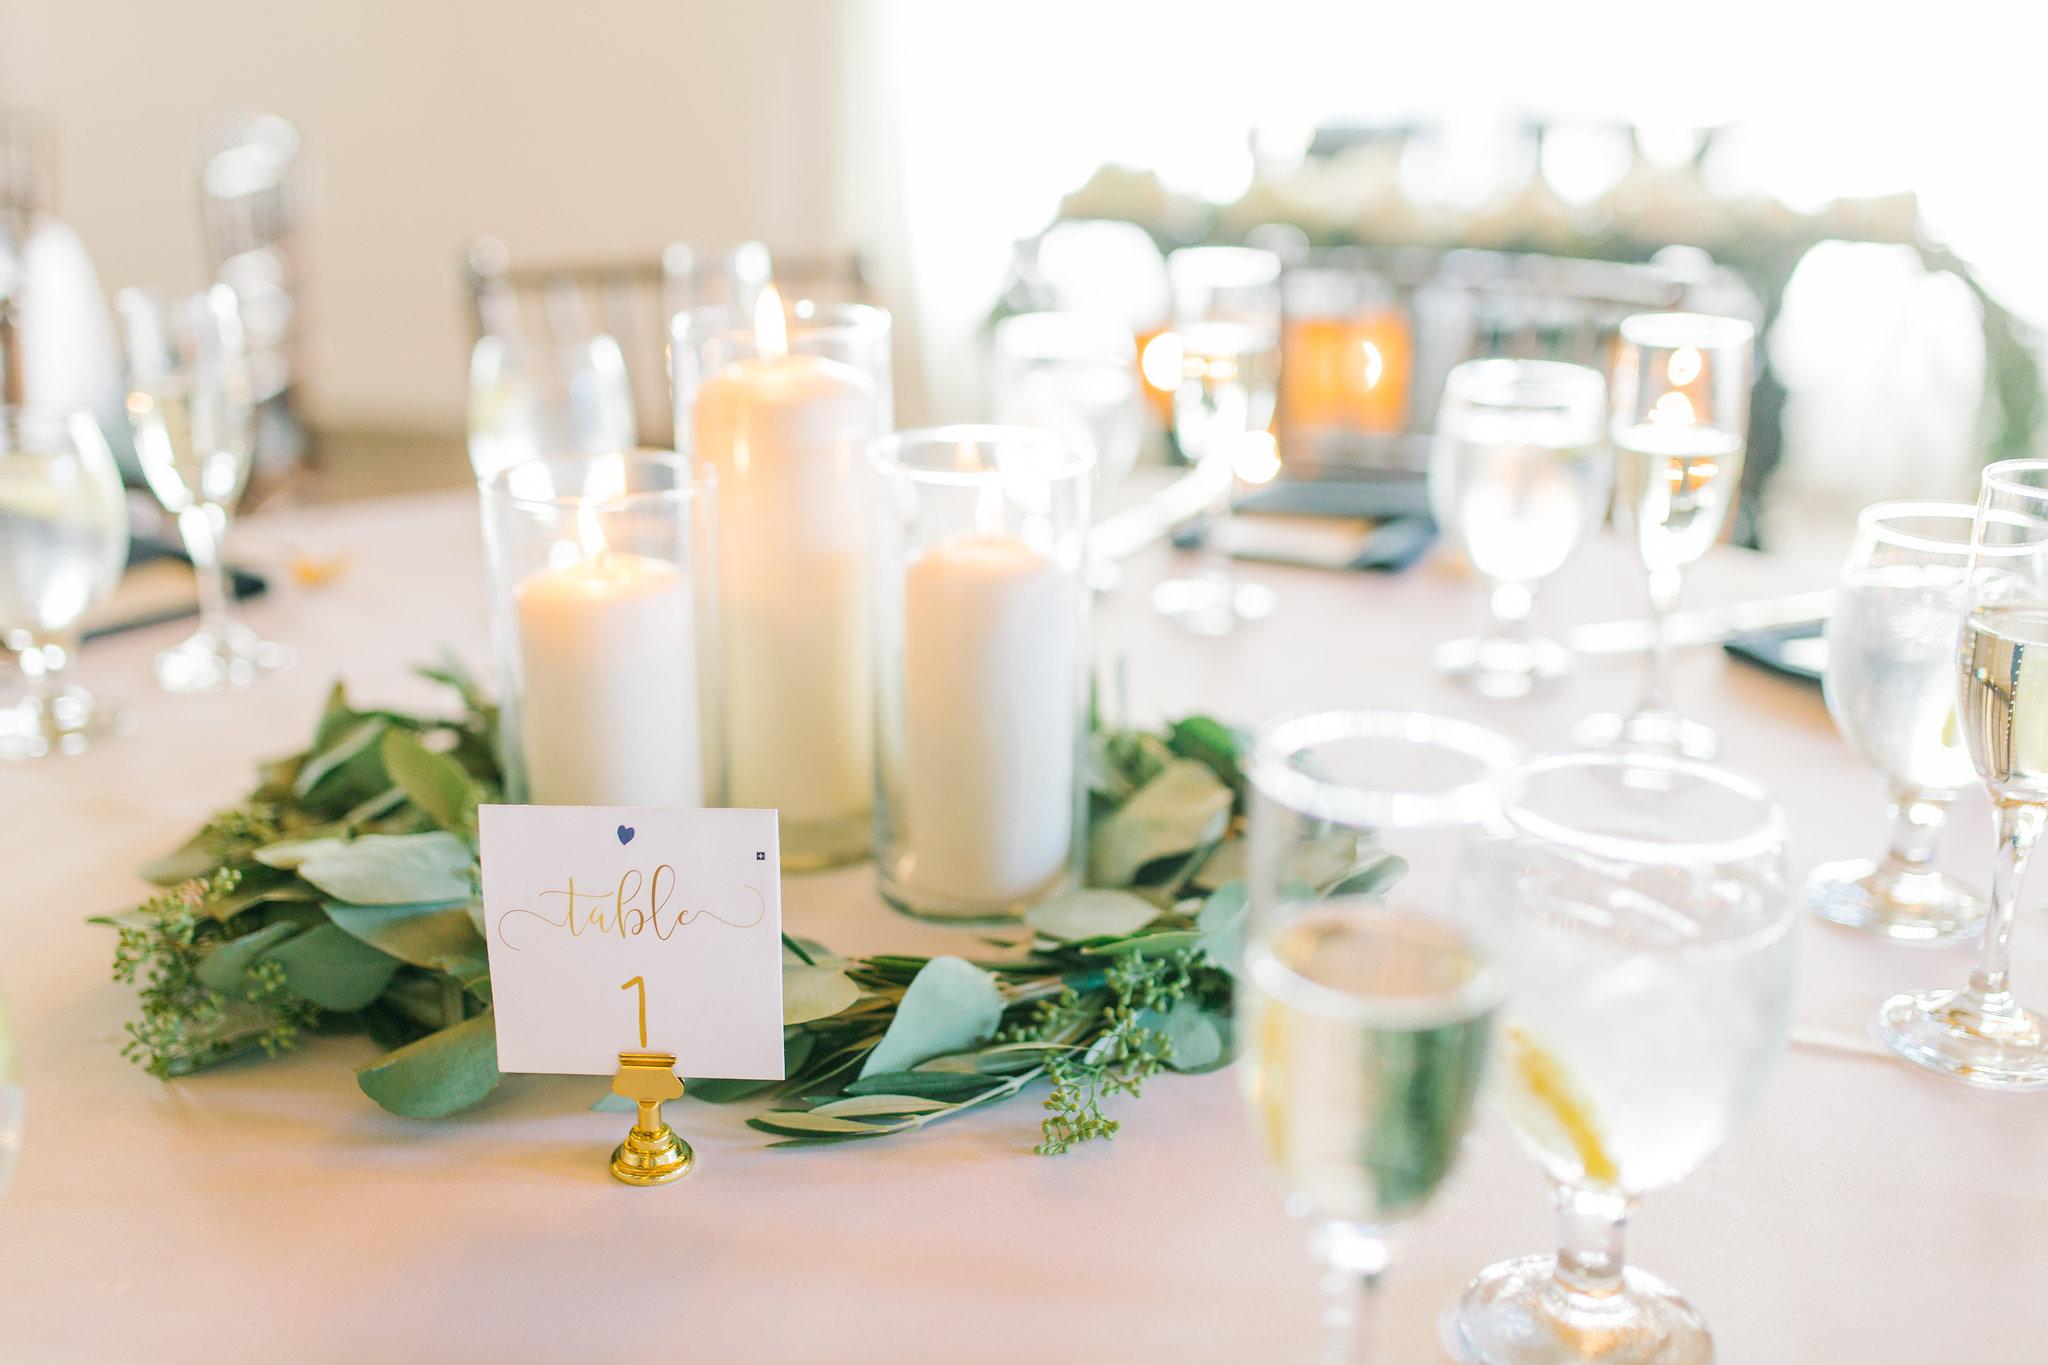 San Clemente, San clemente beach wedding, the casino san clemente, candle votive centerpiece, minimalist wedding design, green and gold wedding, eucalyptus garland centerpiece